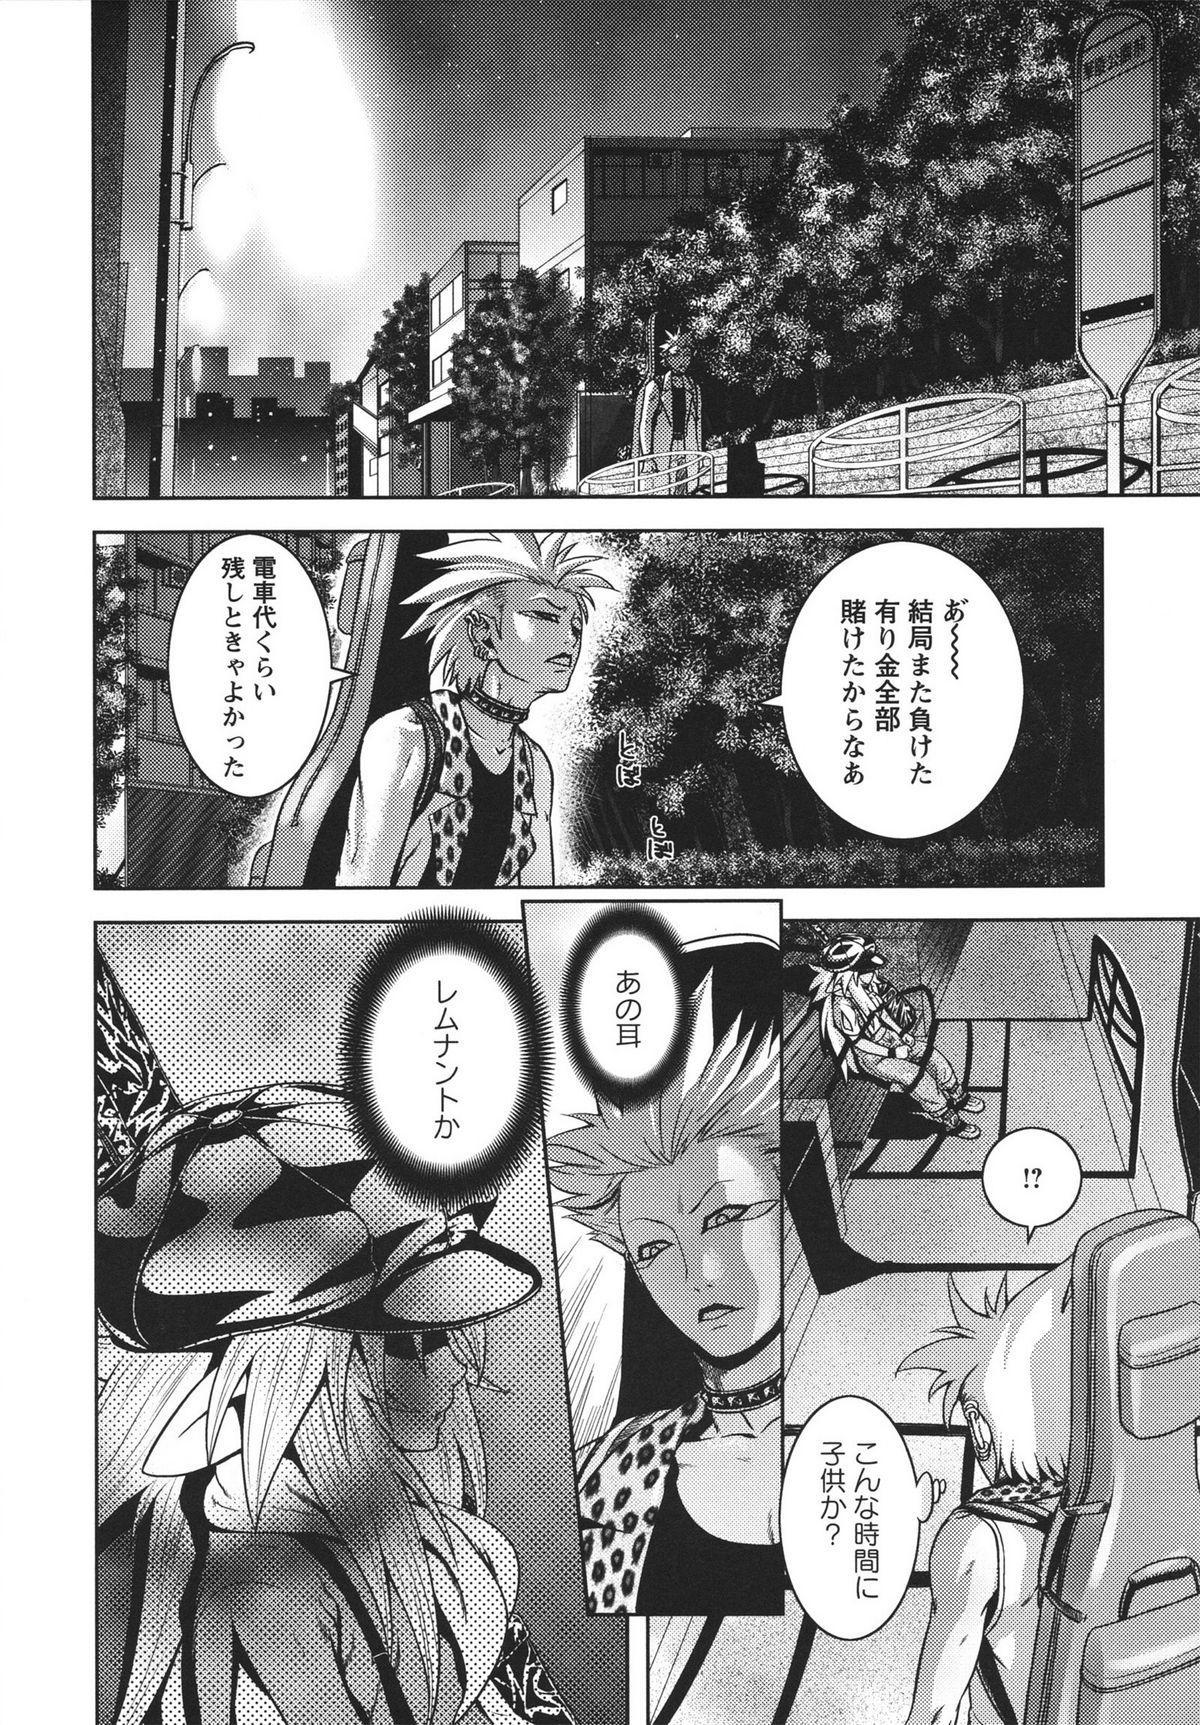 [Kawazuko Chouji] m7 -Minor Seven- Jou 35